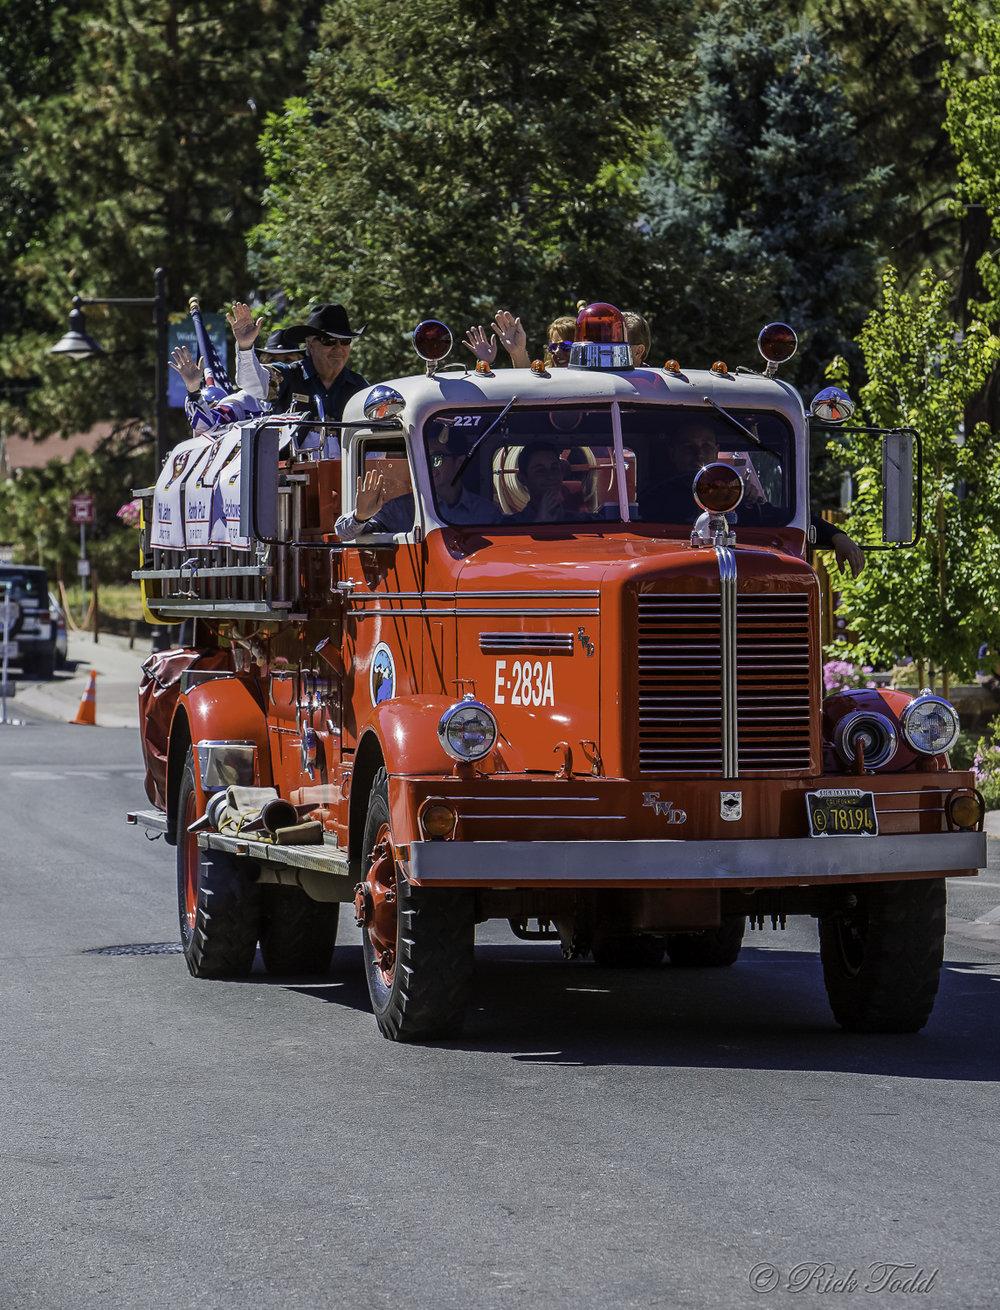 Small town USA parade. Gotta love them.